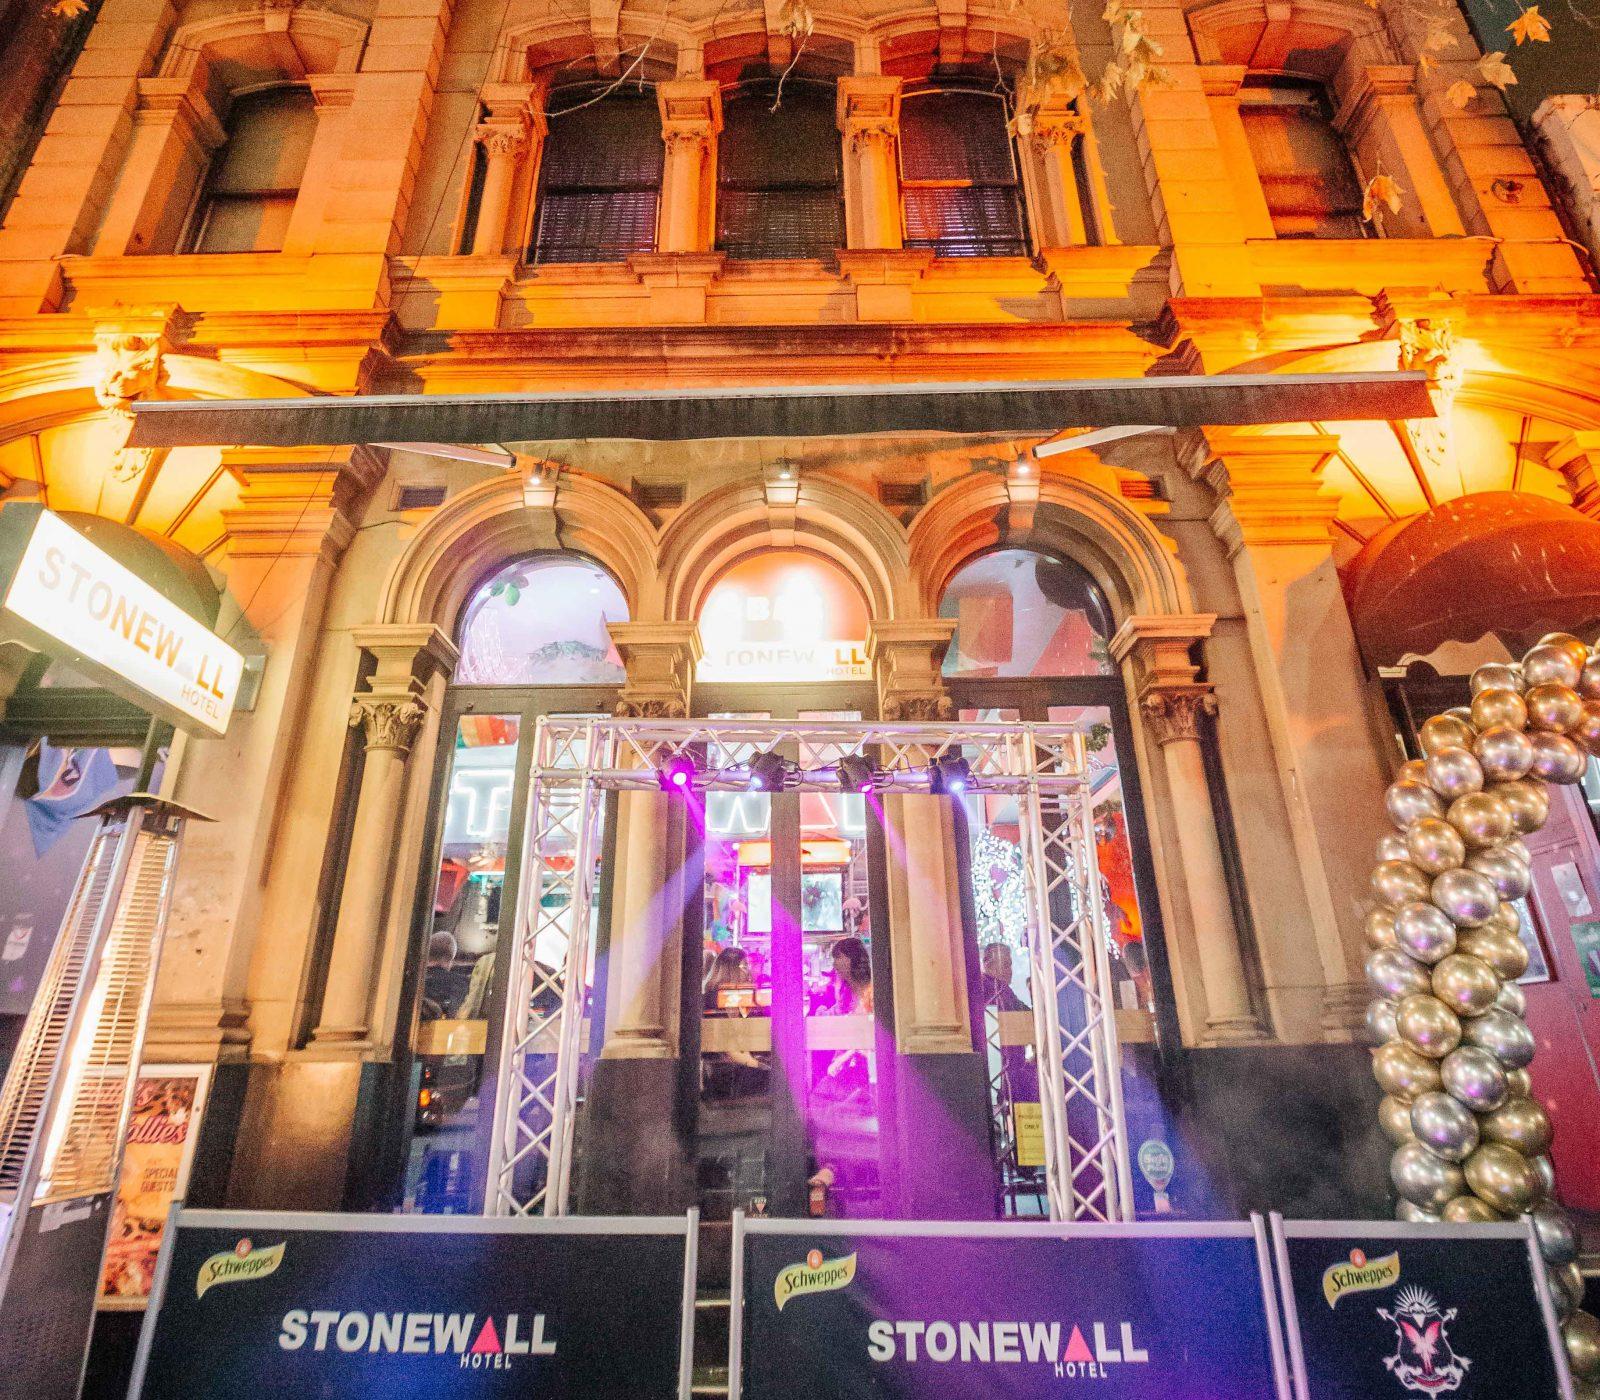 Stonewall Hotel Sydney